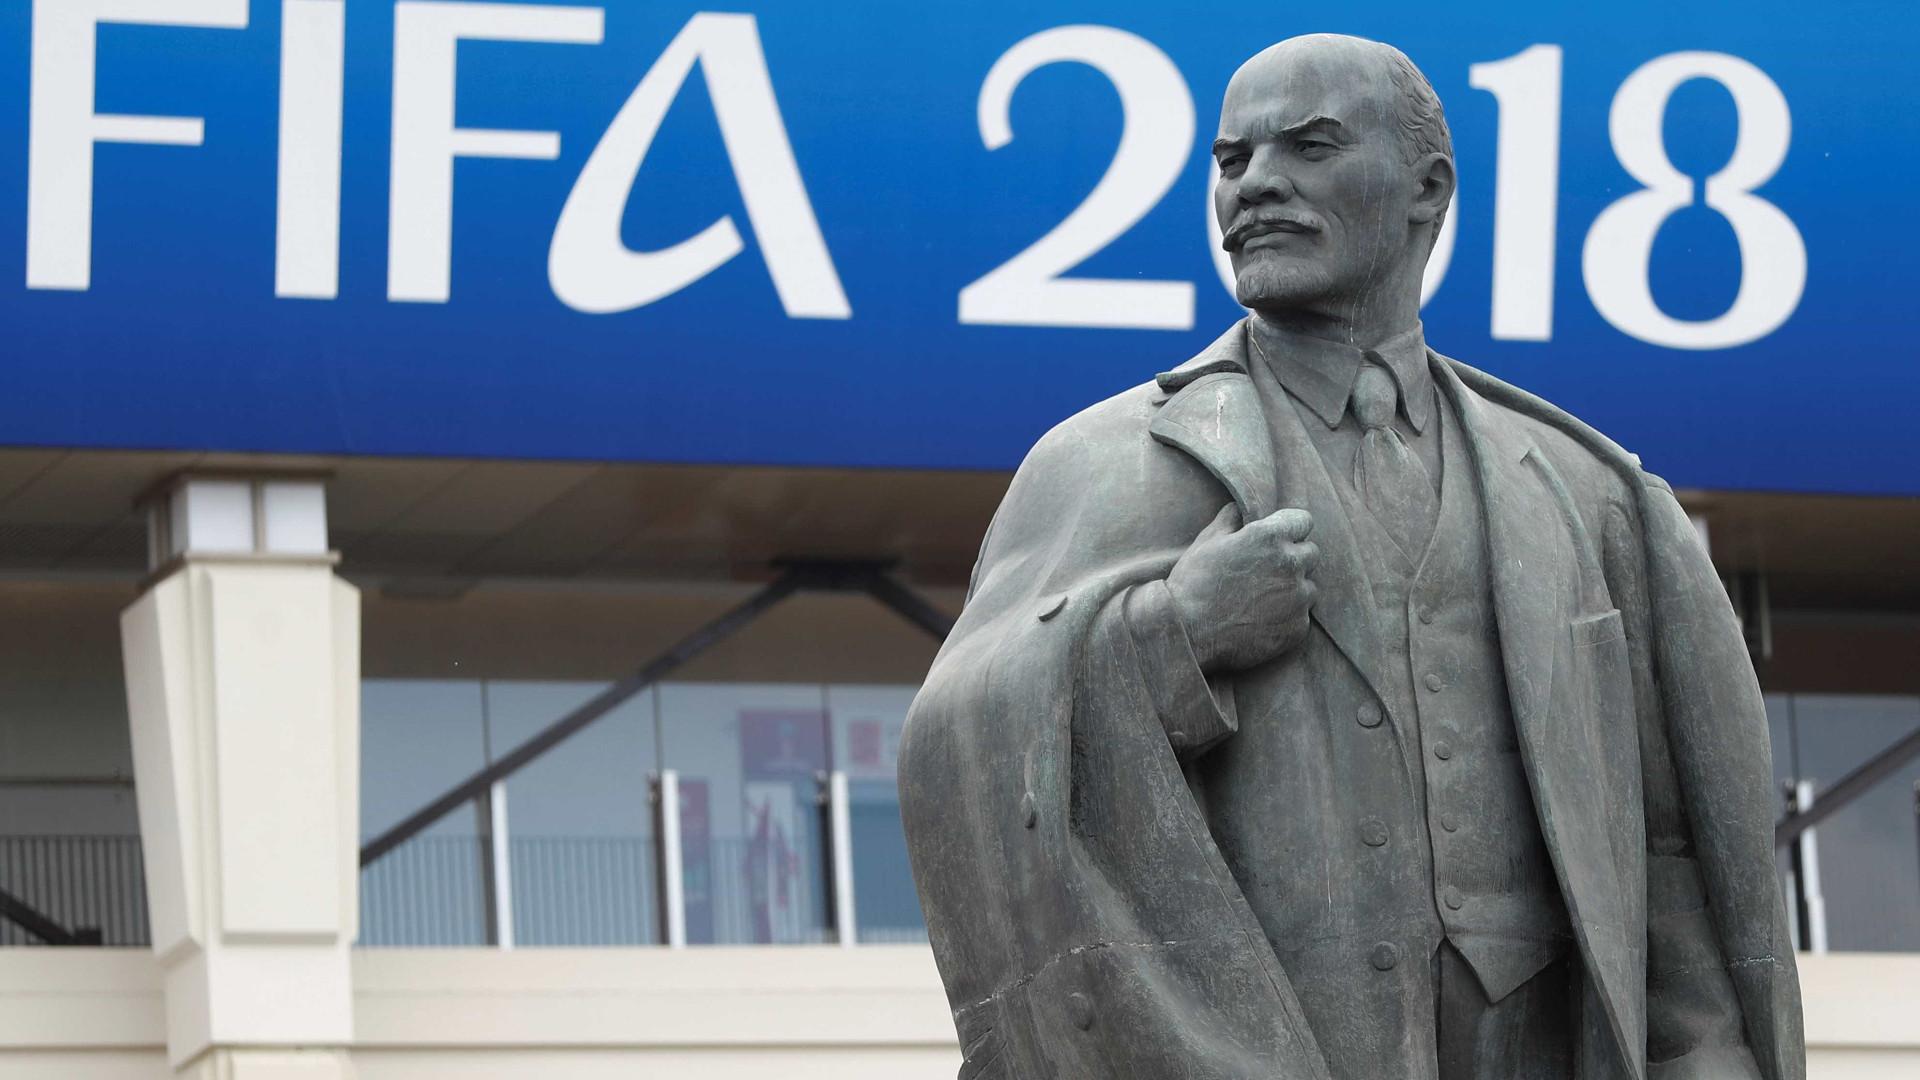 Moscou será a grande protagonista da Copa, palco da abertura e final